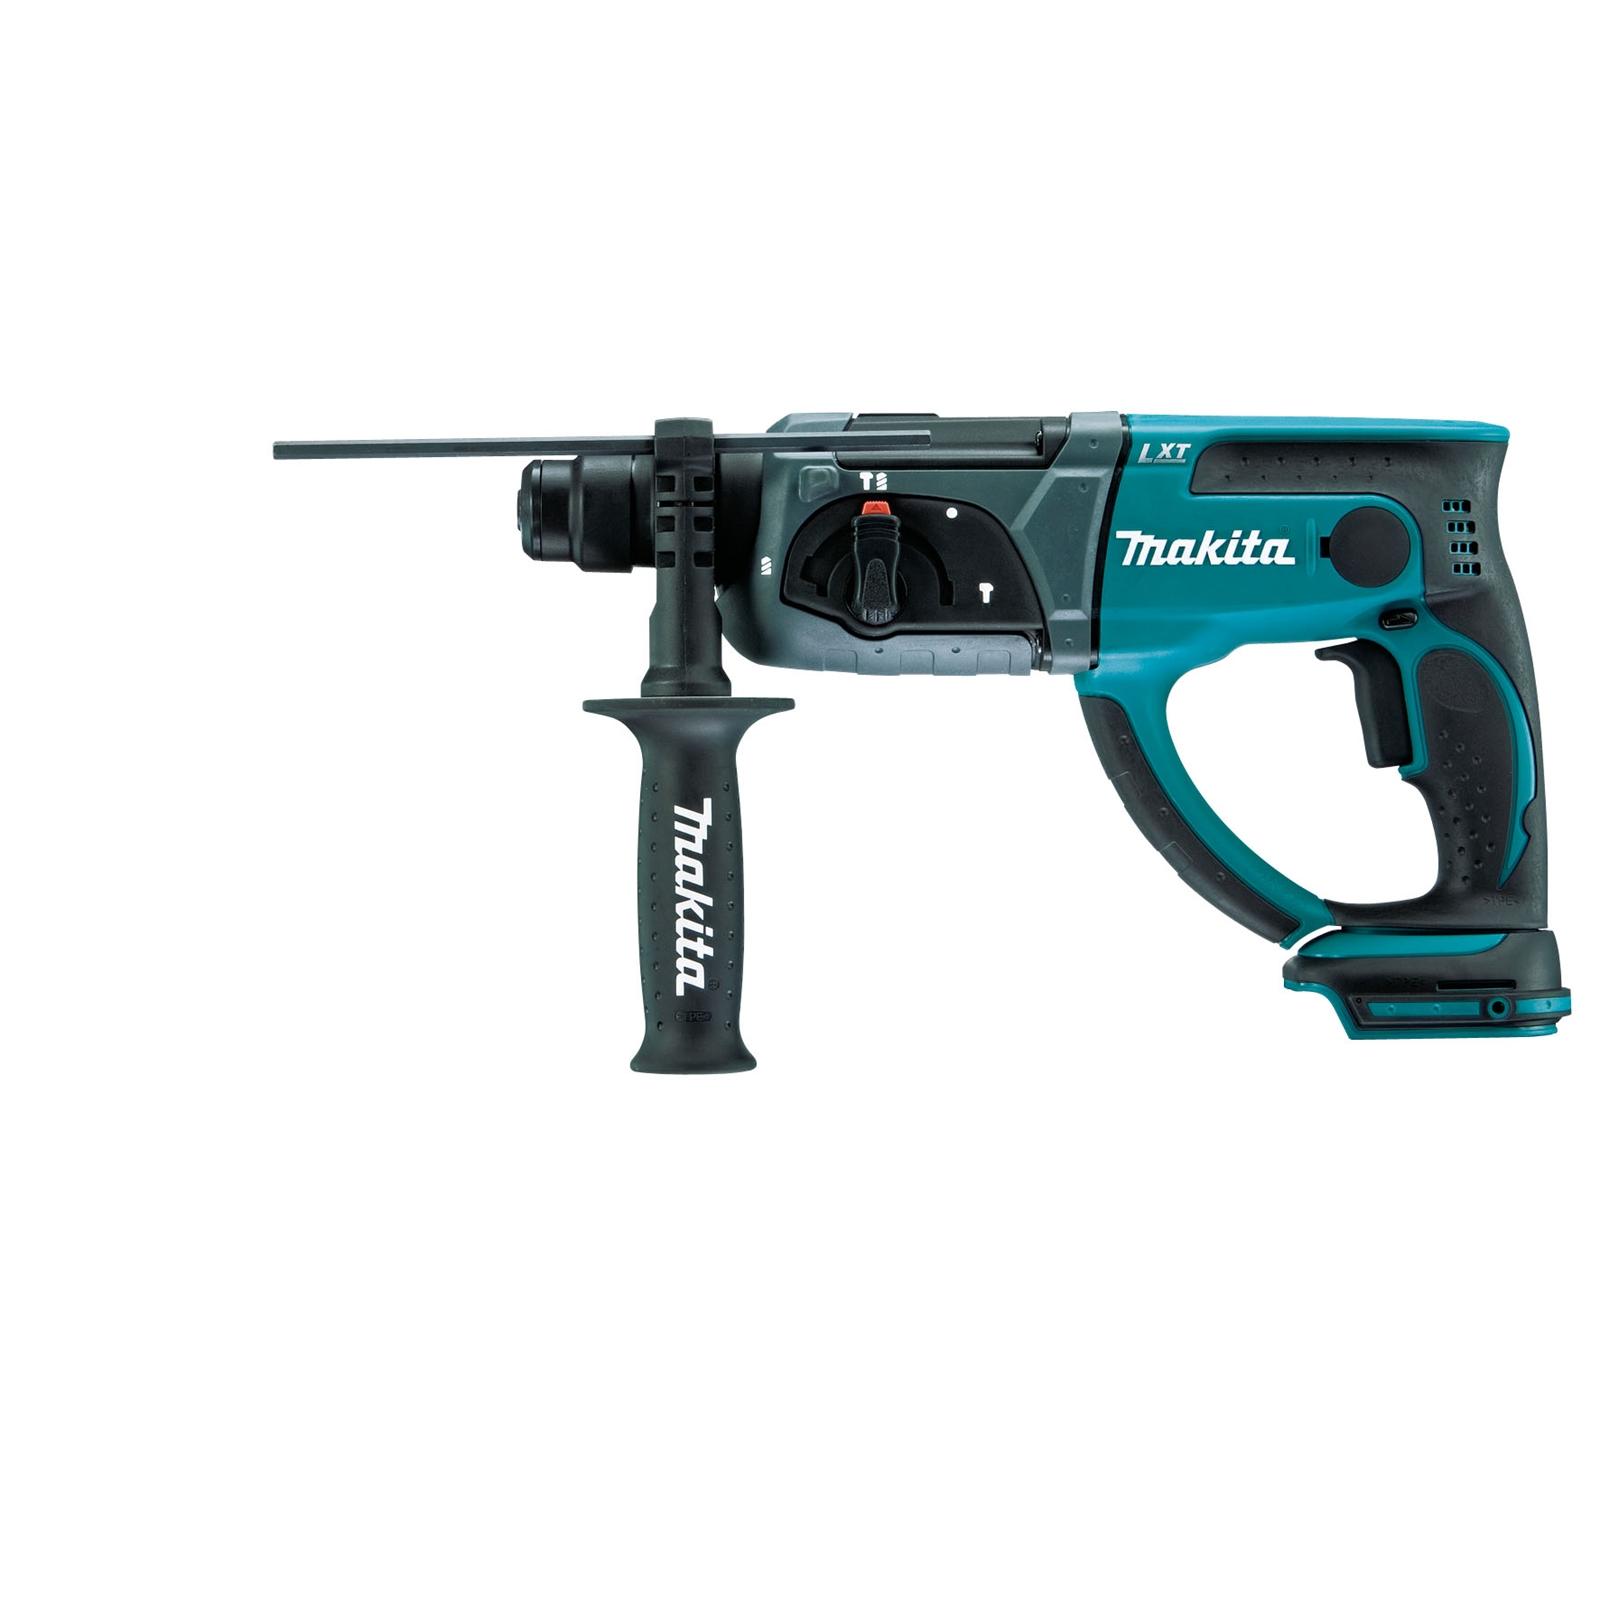 Makita 18V Cordless Rotary Hammer Drill - Skin Only